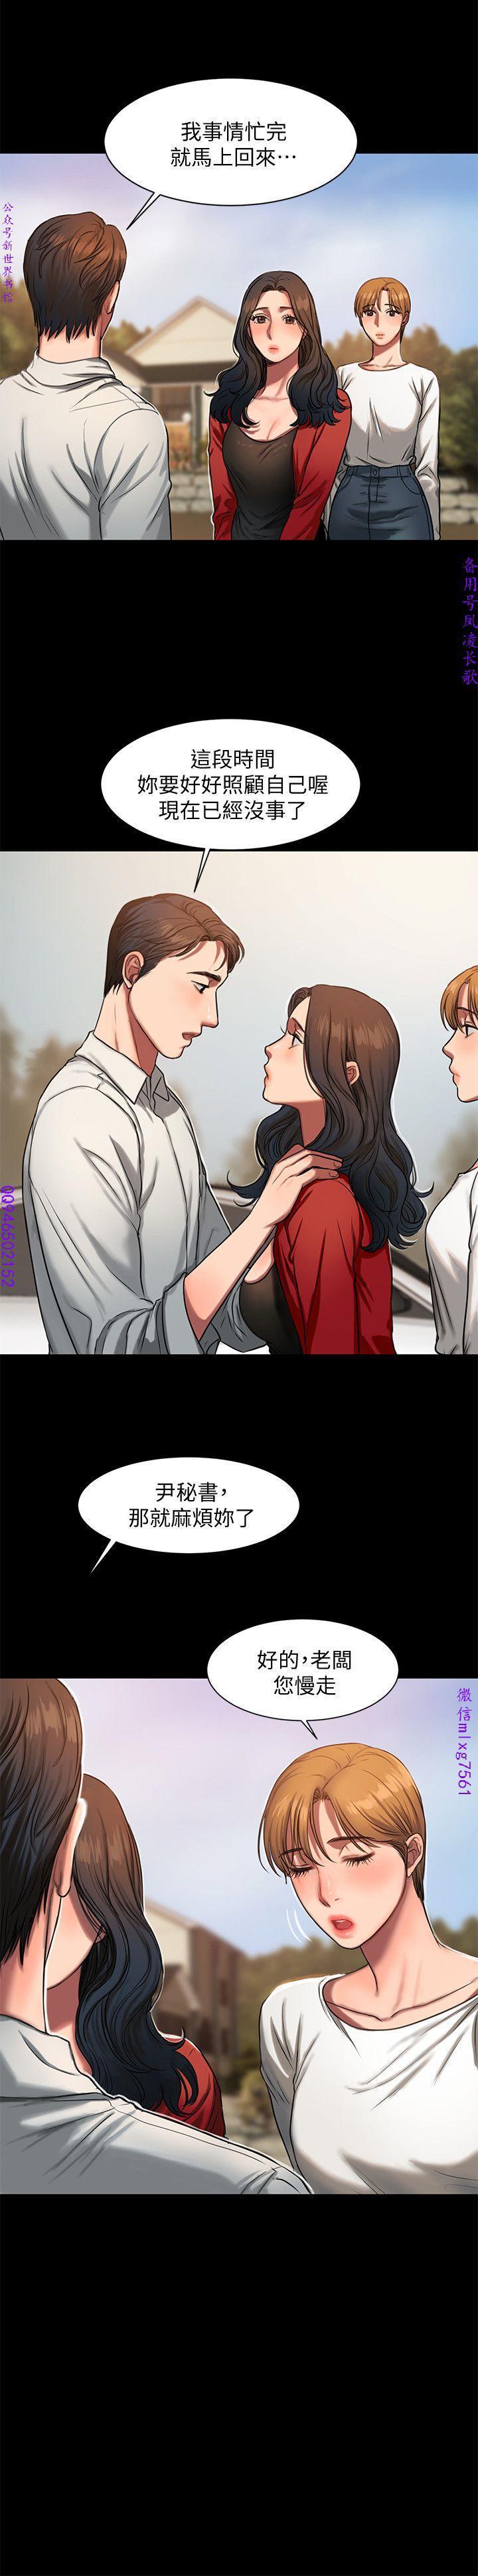 Run away 1-10【中文】 181